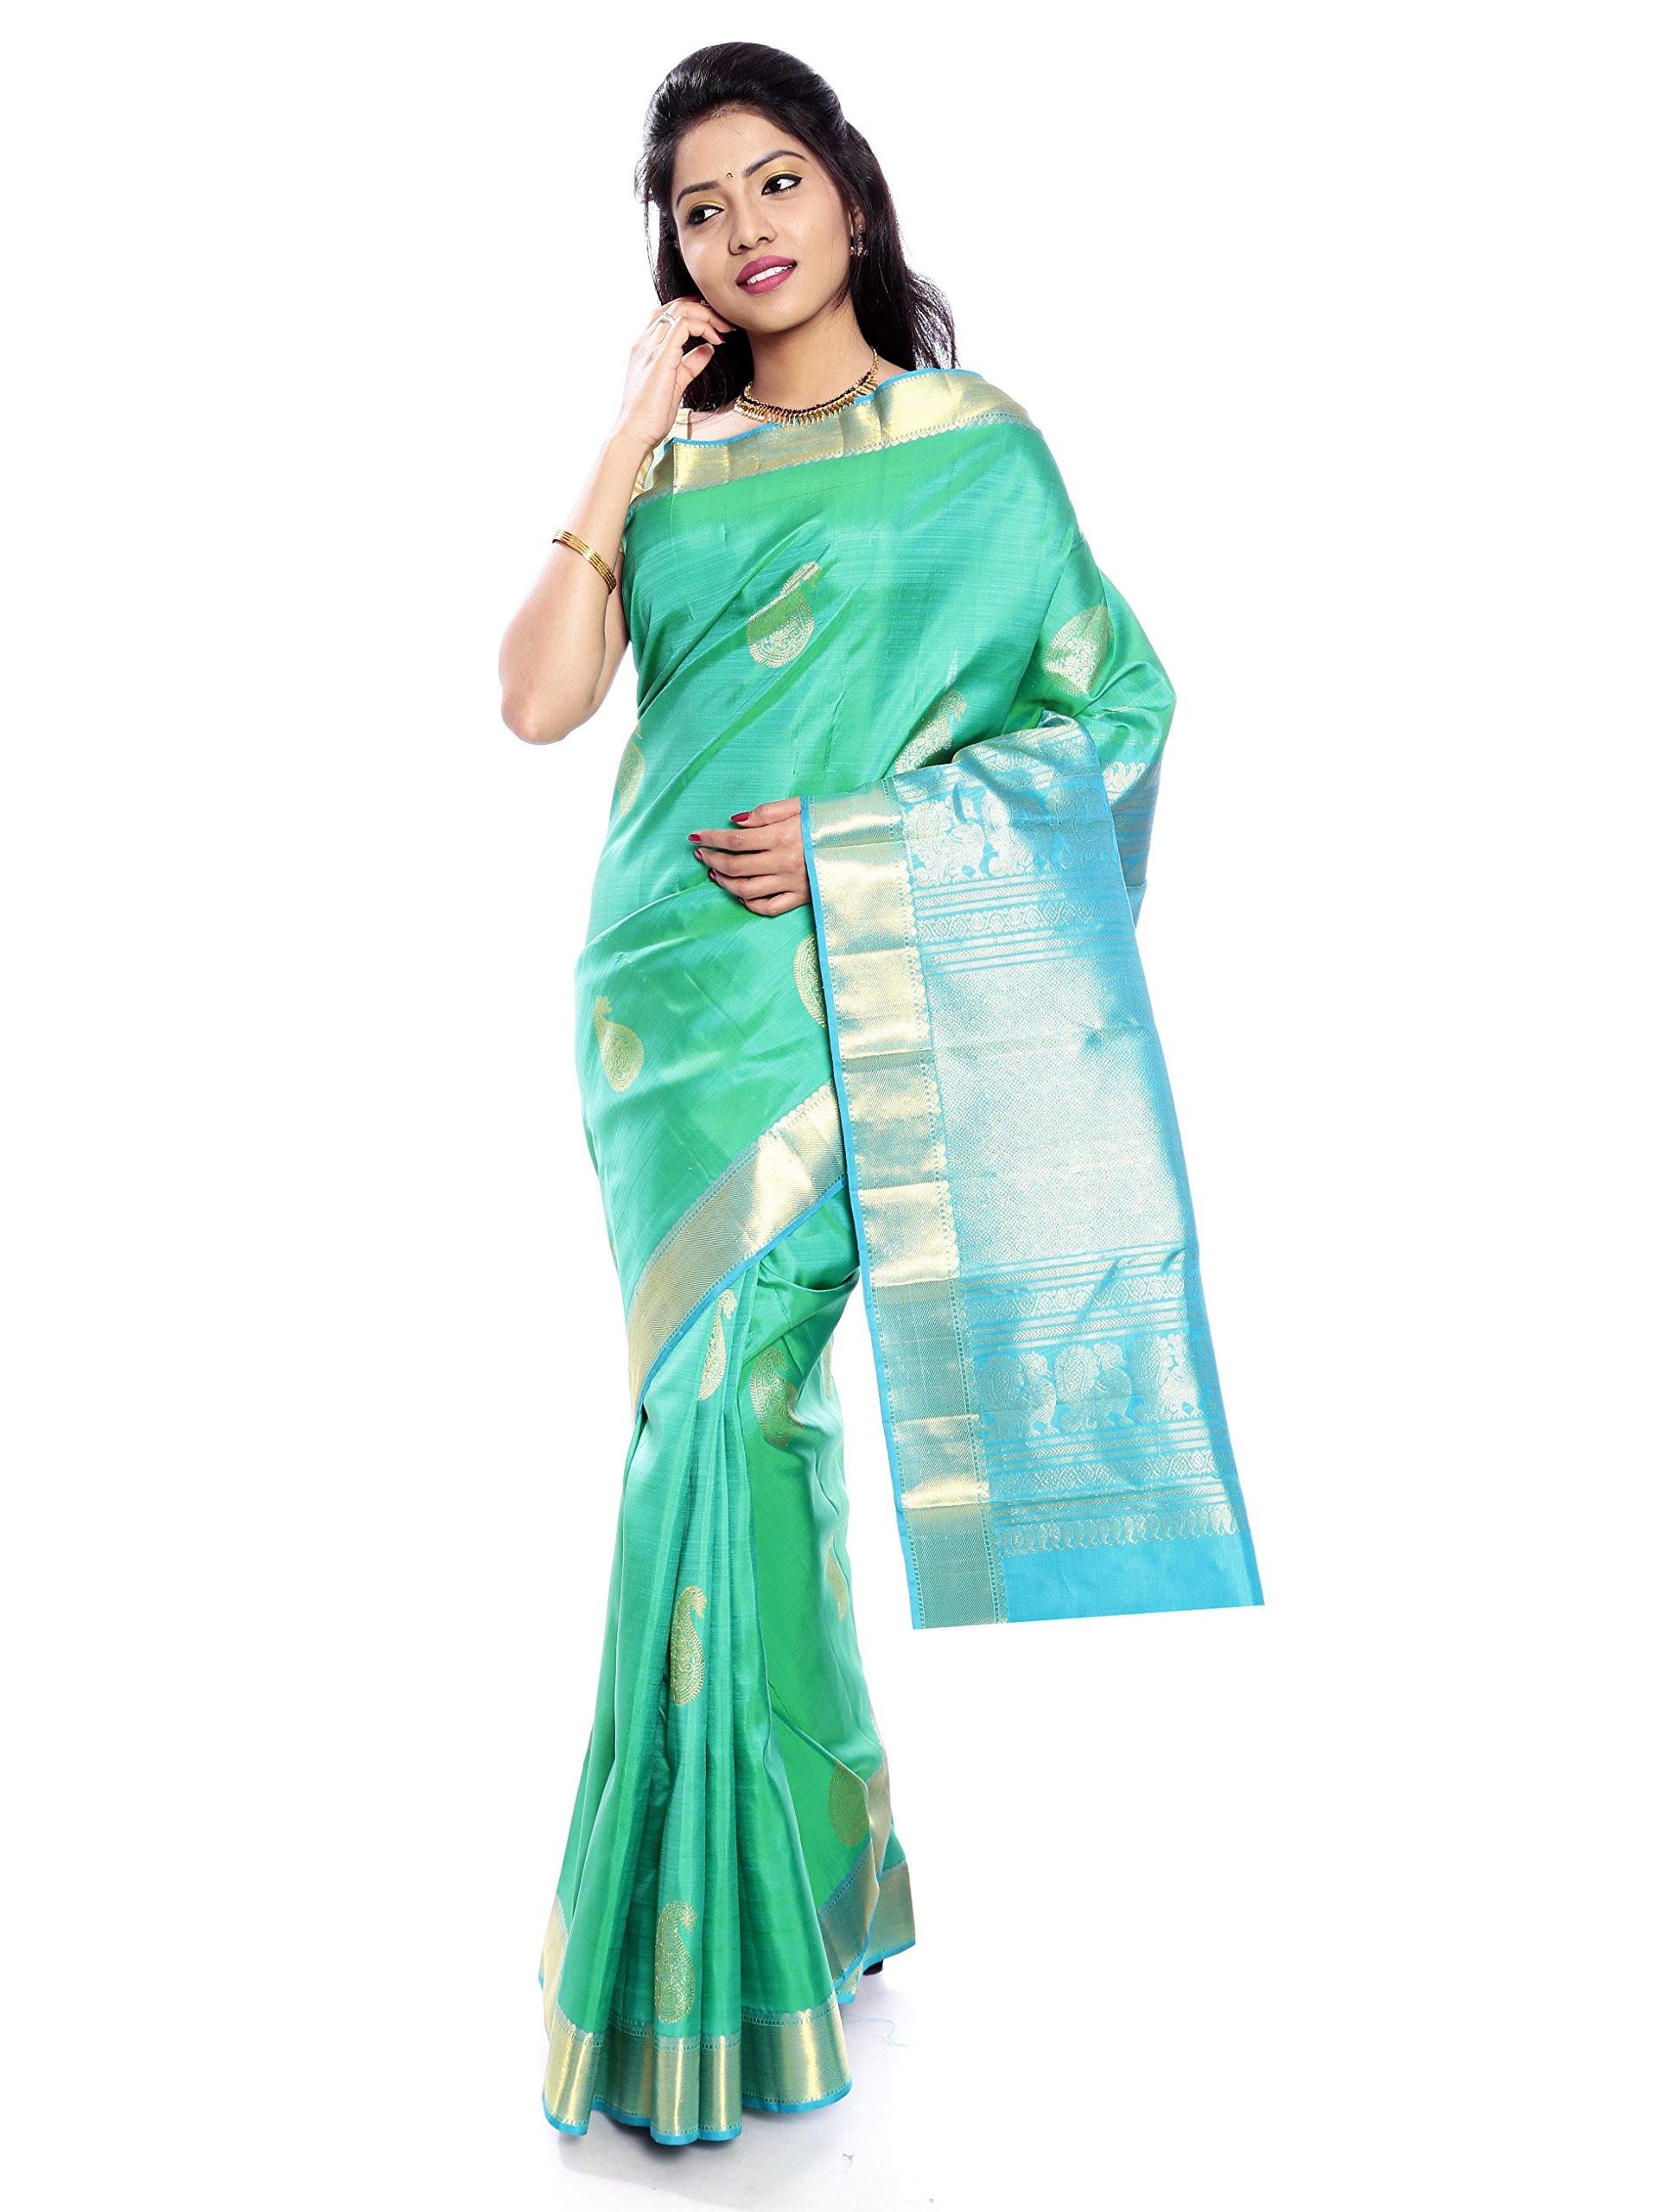 Mandakini — Indian Women's Kanchipuram - Handloom - Pure Silk Saree (Green ) (MK225) by Mandakini (Image #1)